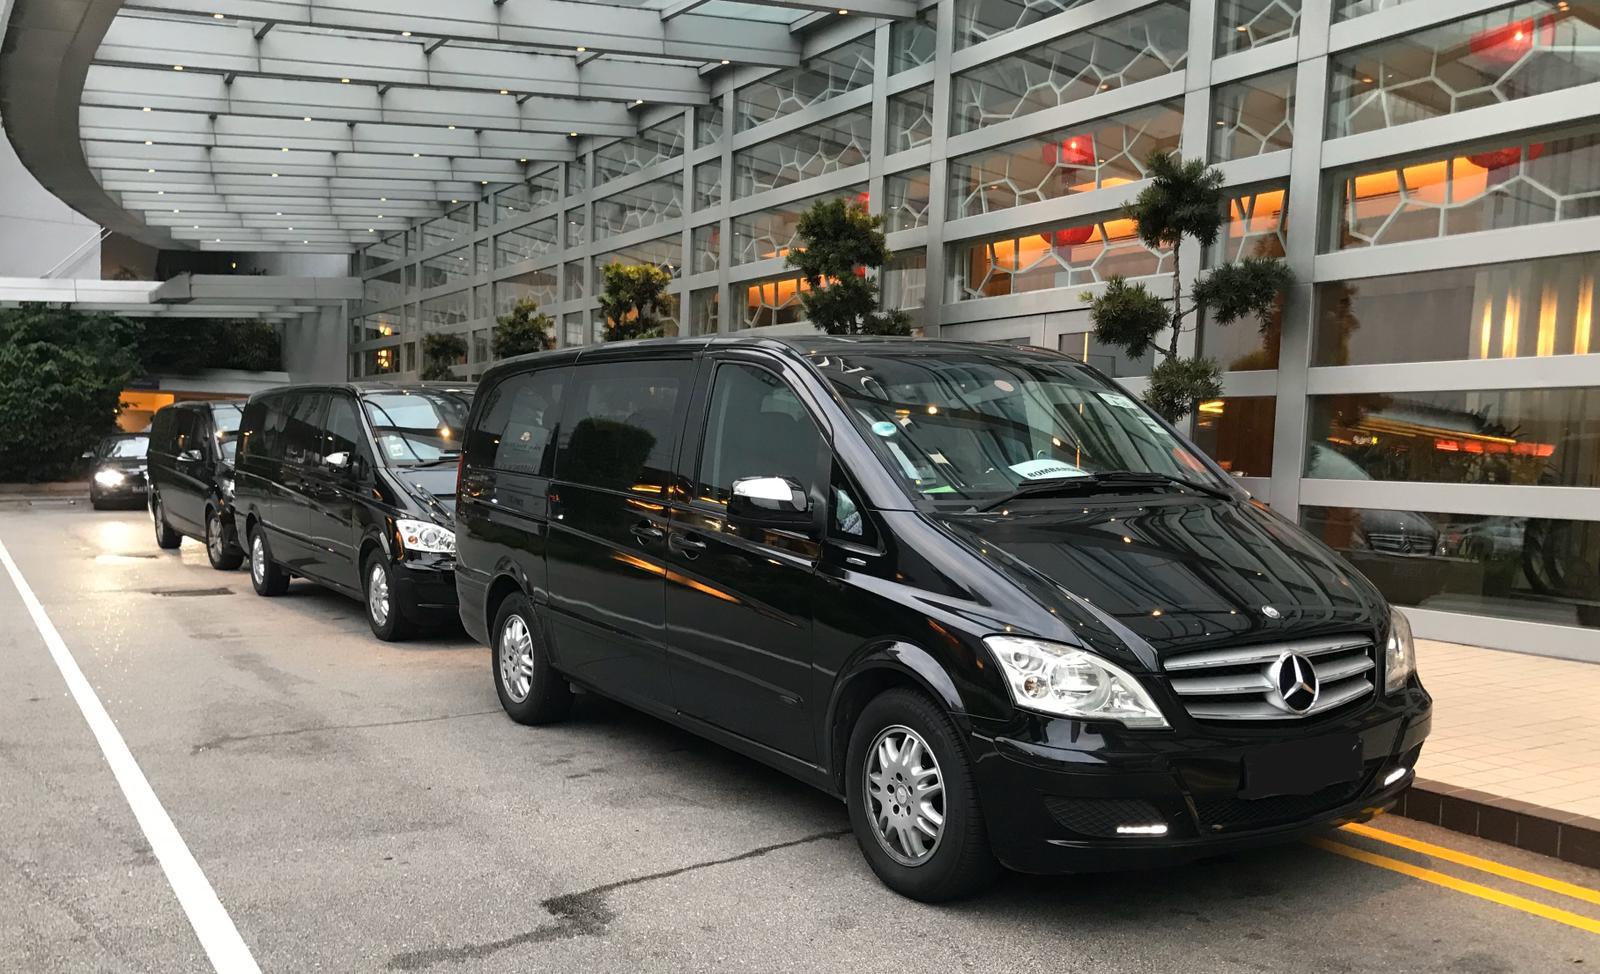 Mercedes Benz Viano / V-Class - Convoy